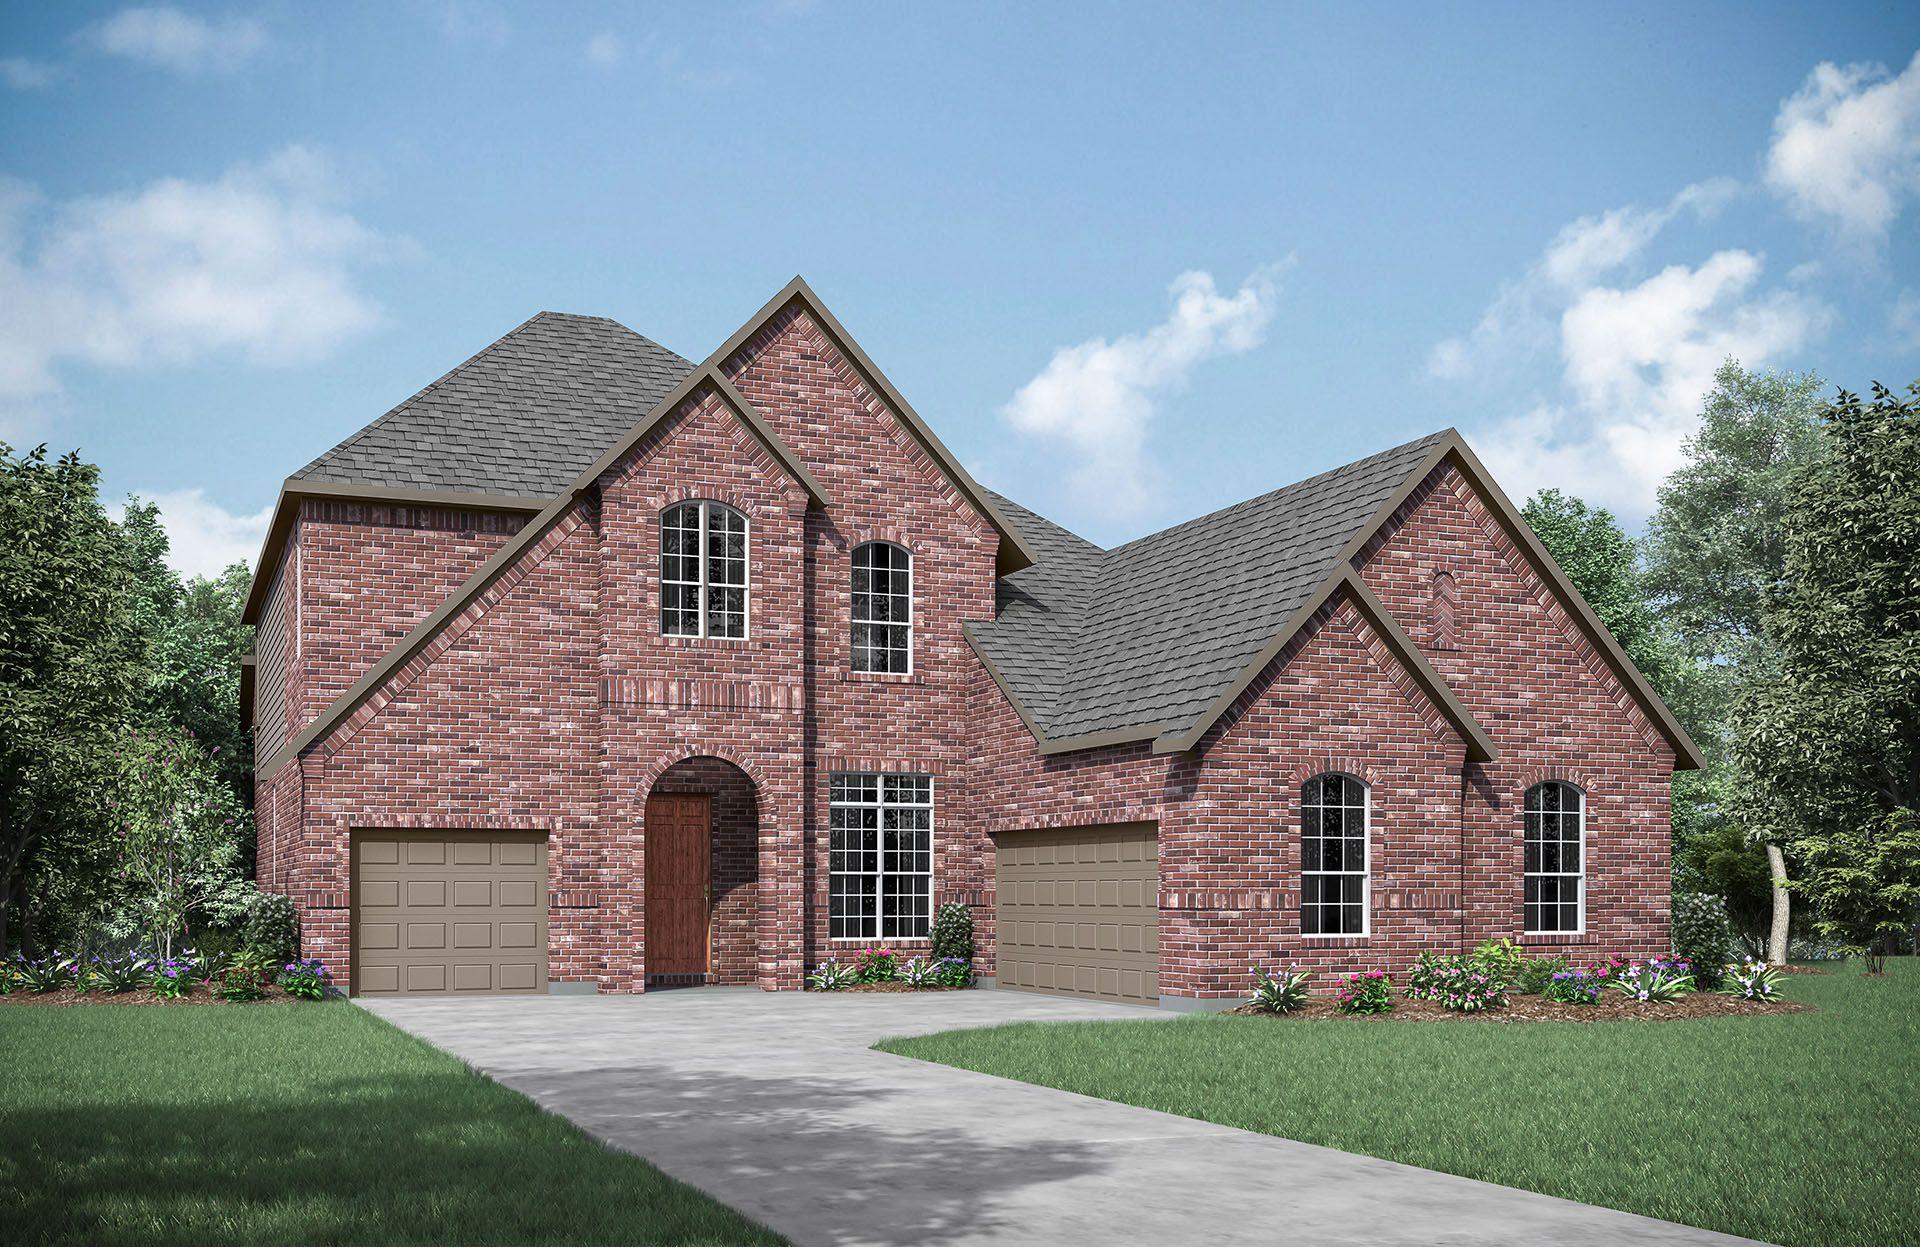 Single Family for Sale at Nine Oaks - Deerfield J 611 Oak Grove Lane Coppell, Texas 75019 United States